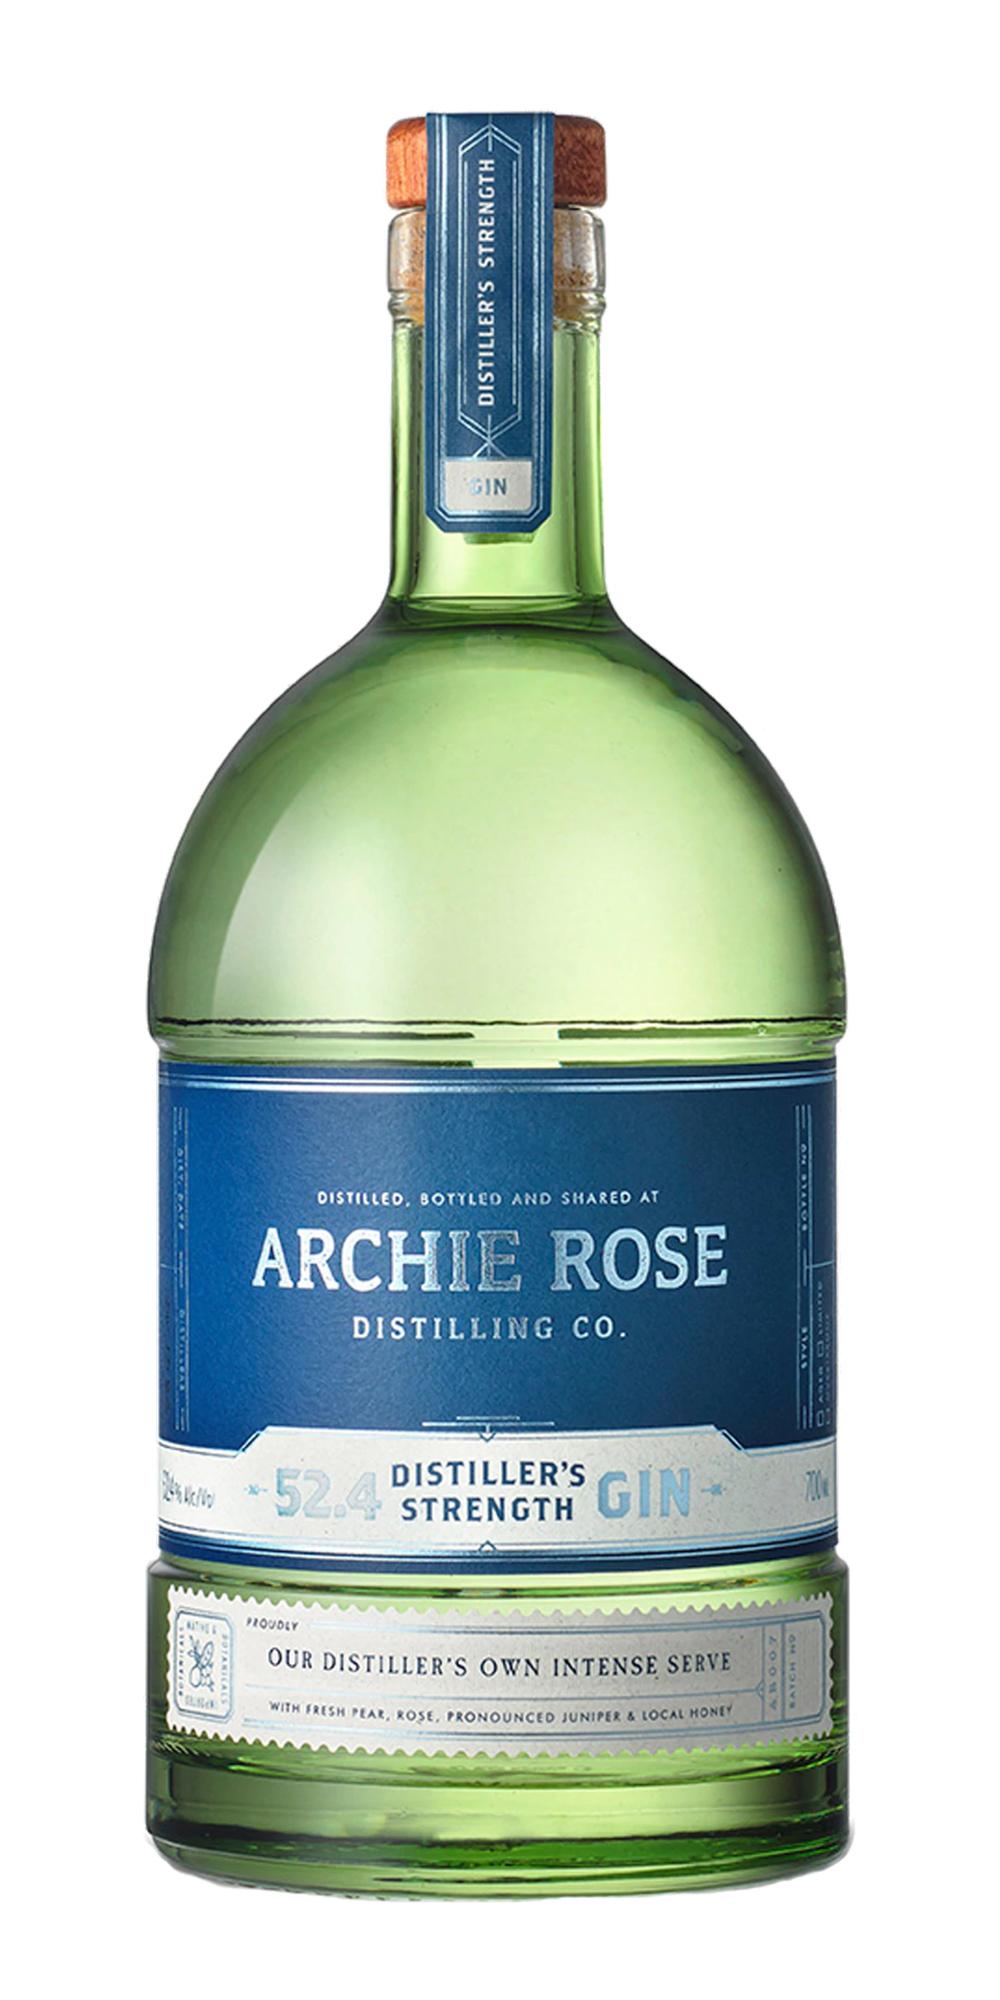 Copy of Archie Rose Distiller's Strength Gin